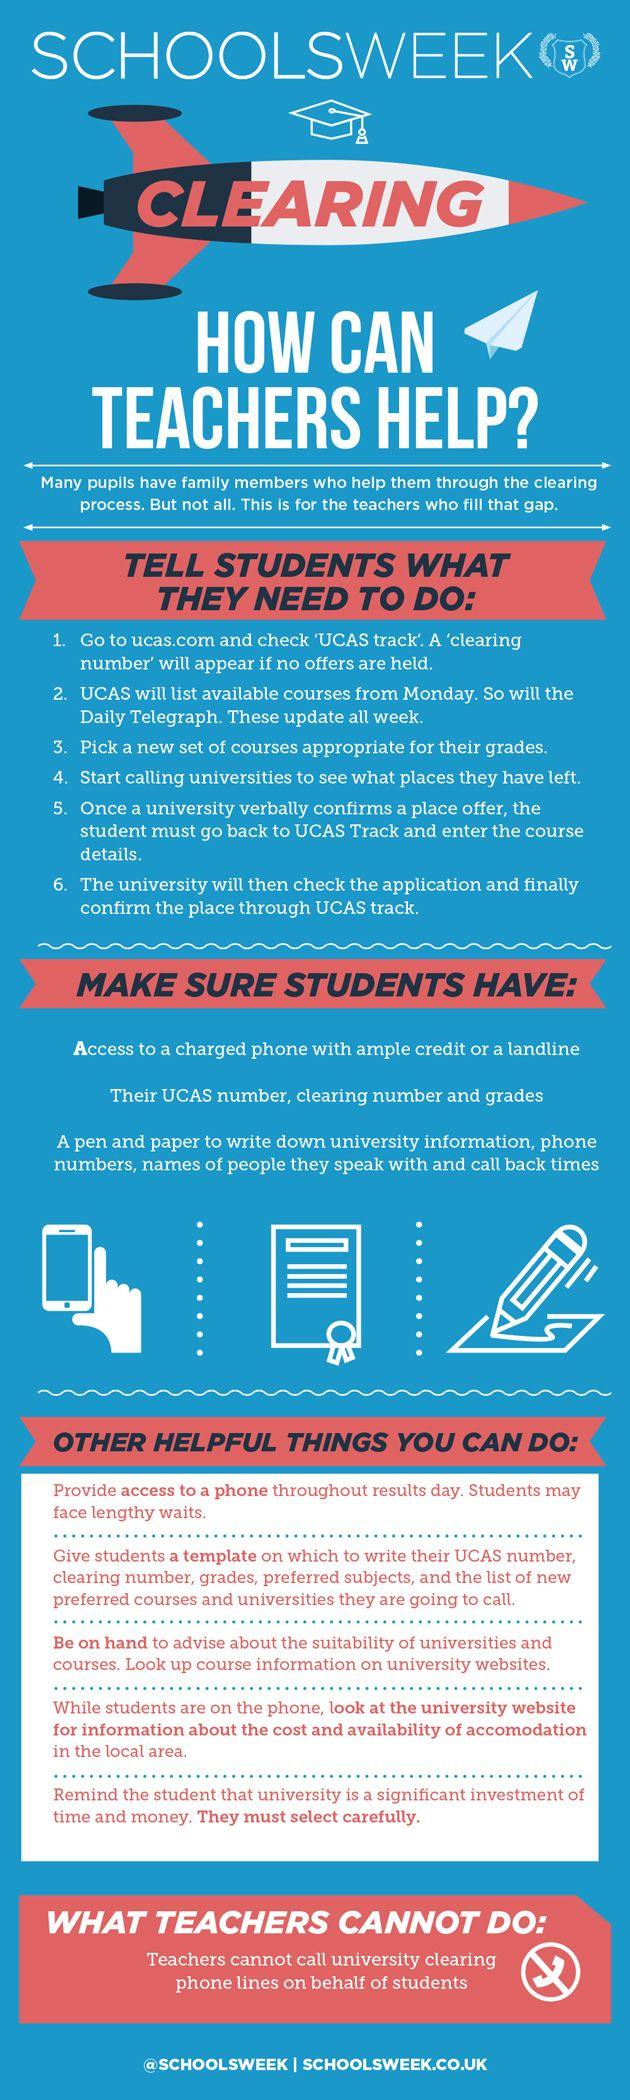 How can teachers help during UCAS Clearing? | Schools Week